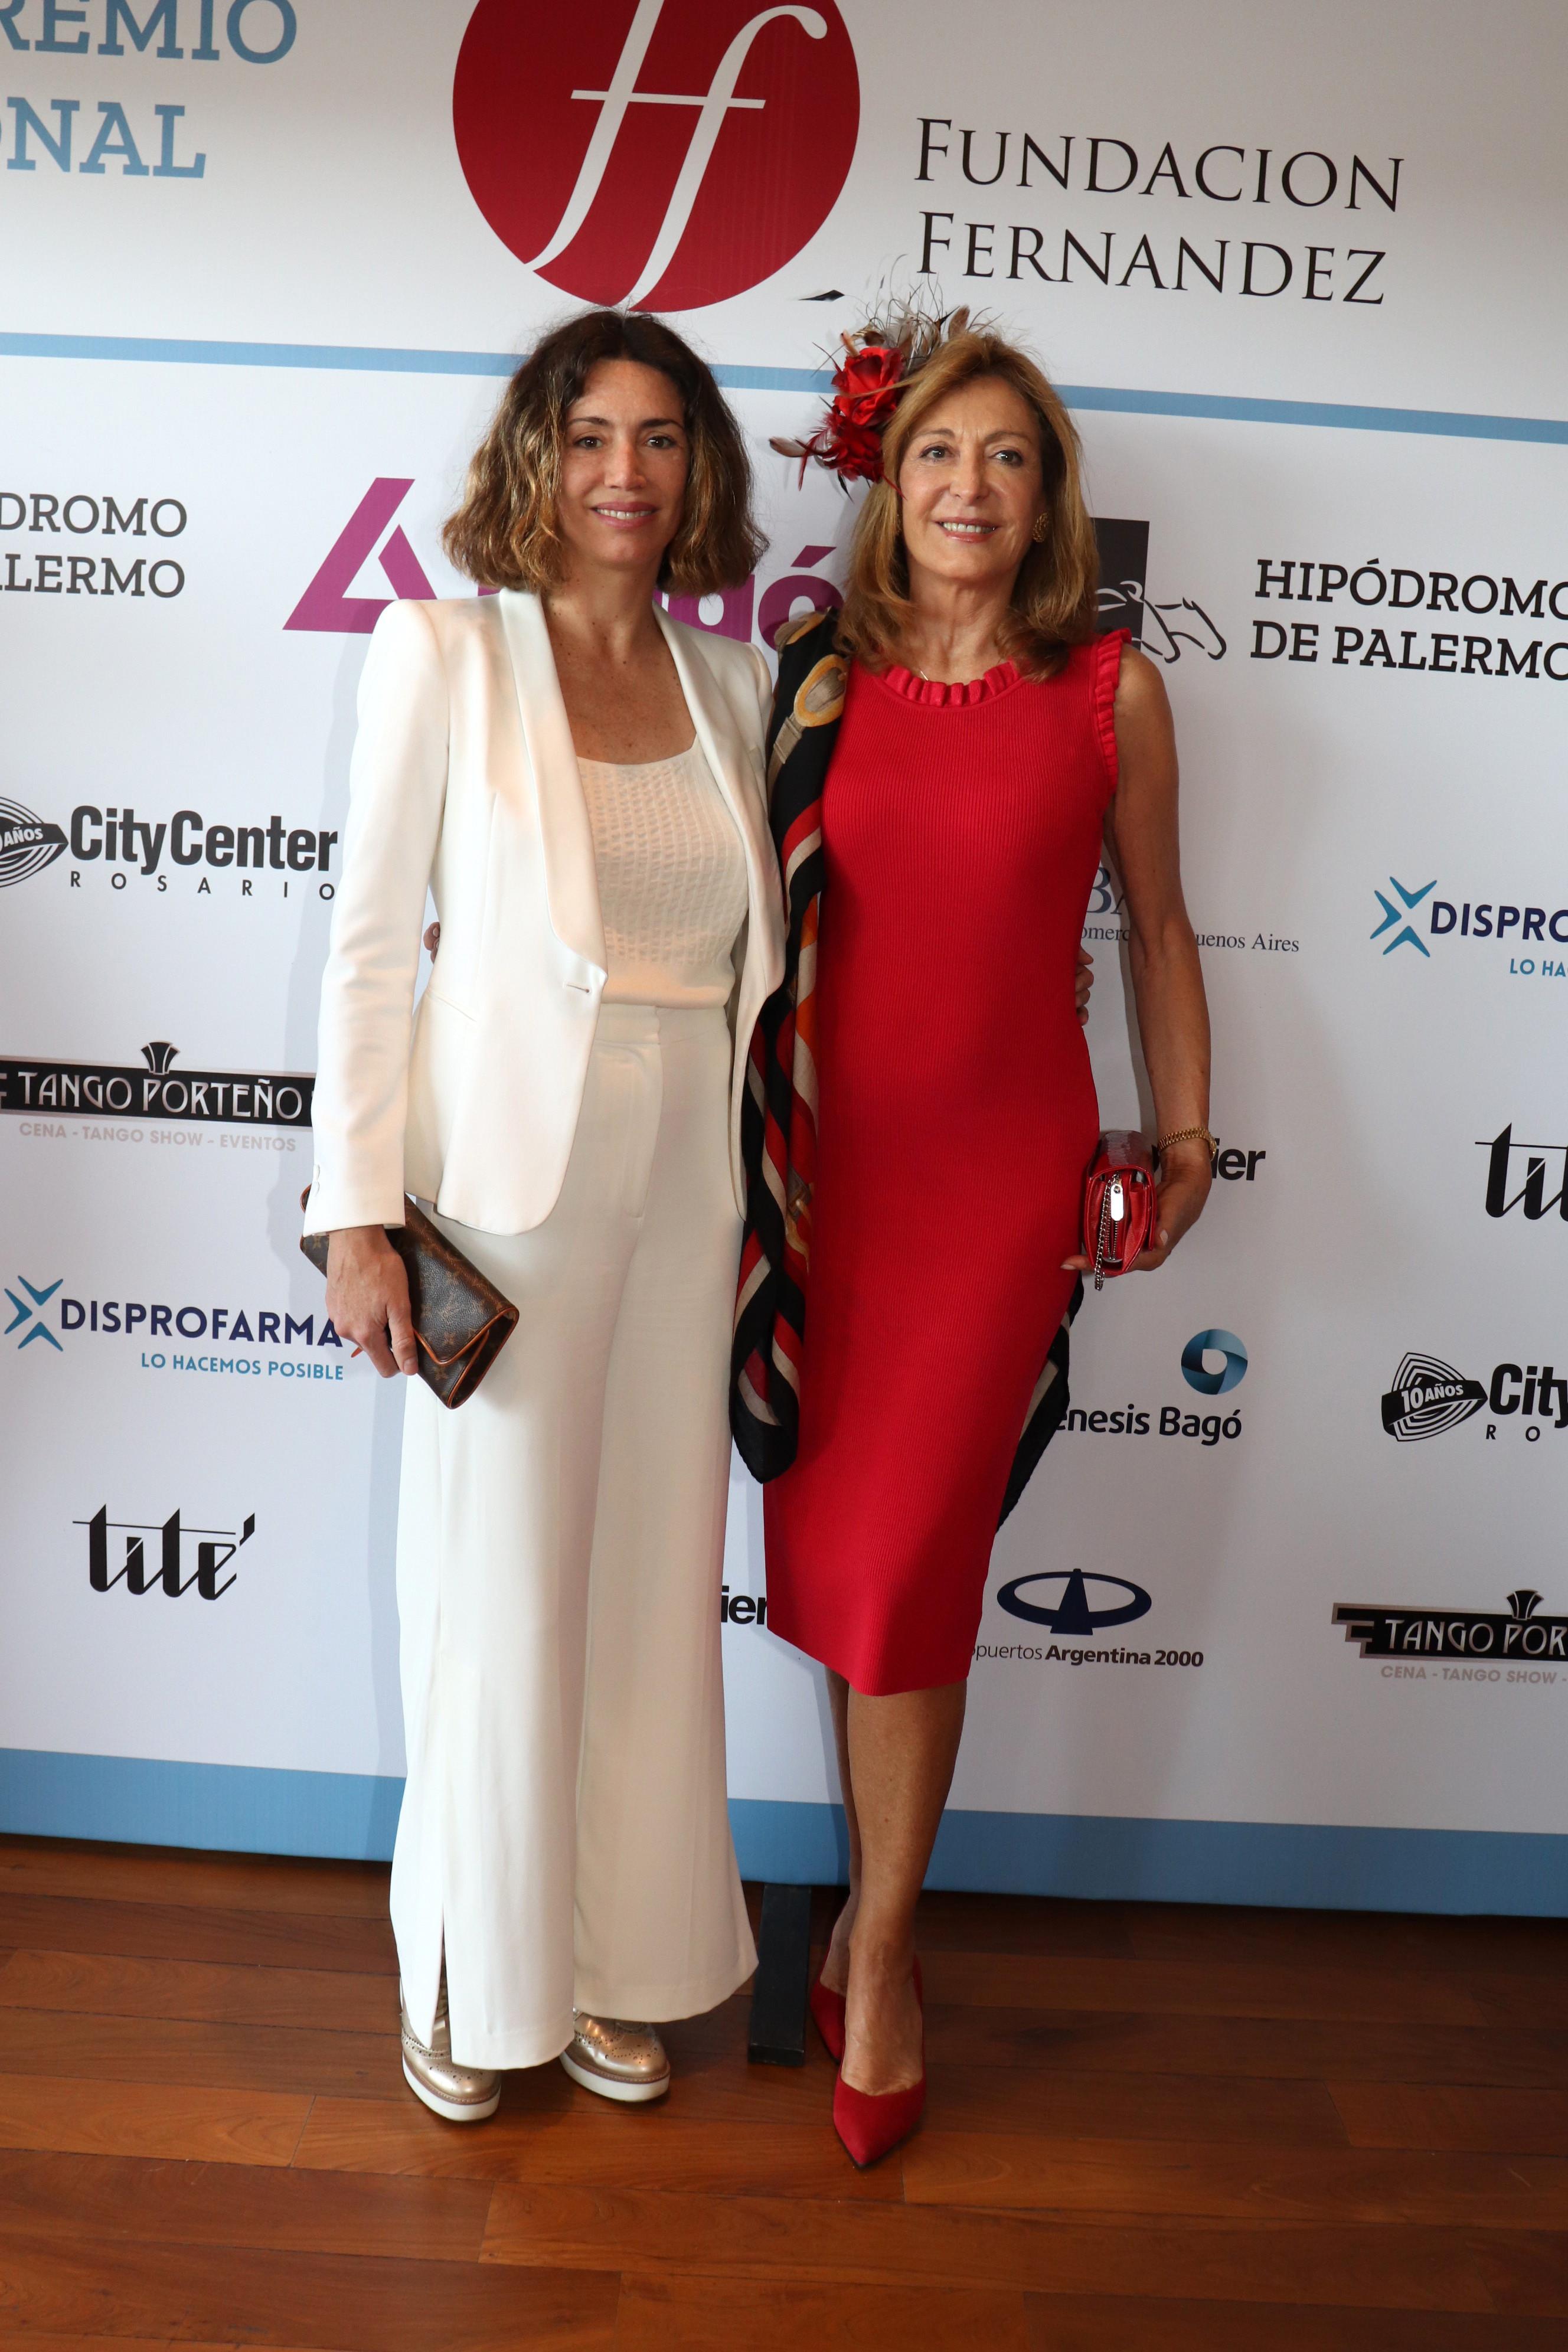 Verónica Quintana y su madre Mariel Llorens de Quintana